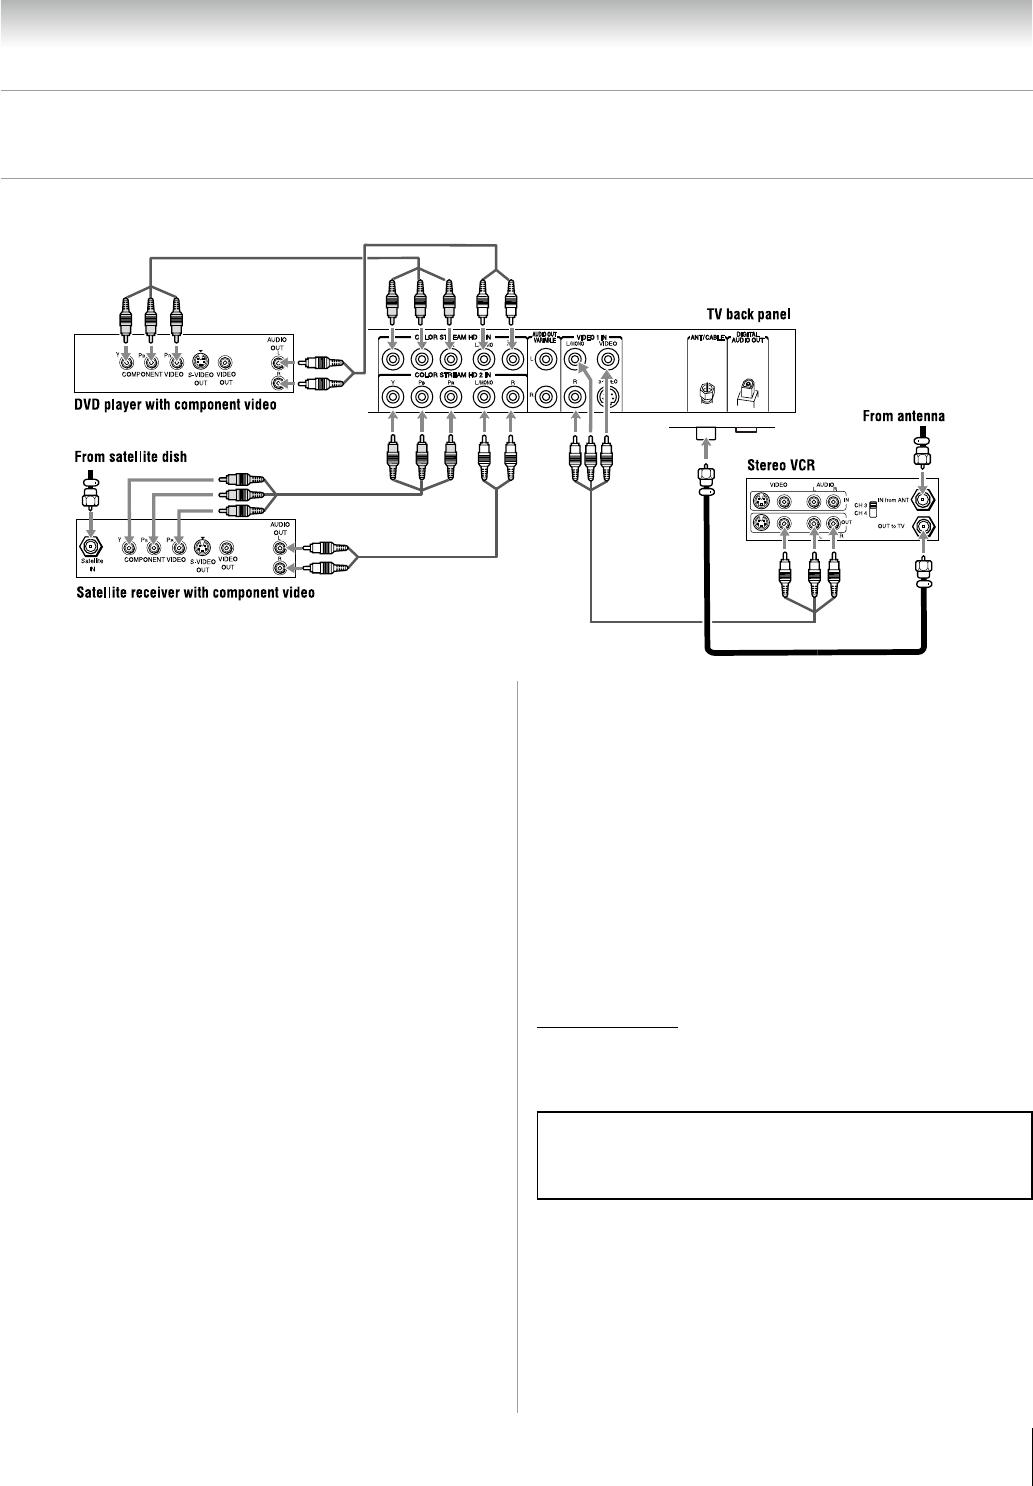 Toshiba 37Av502U Owners Manual